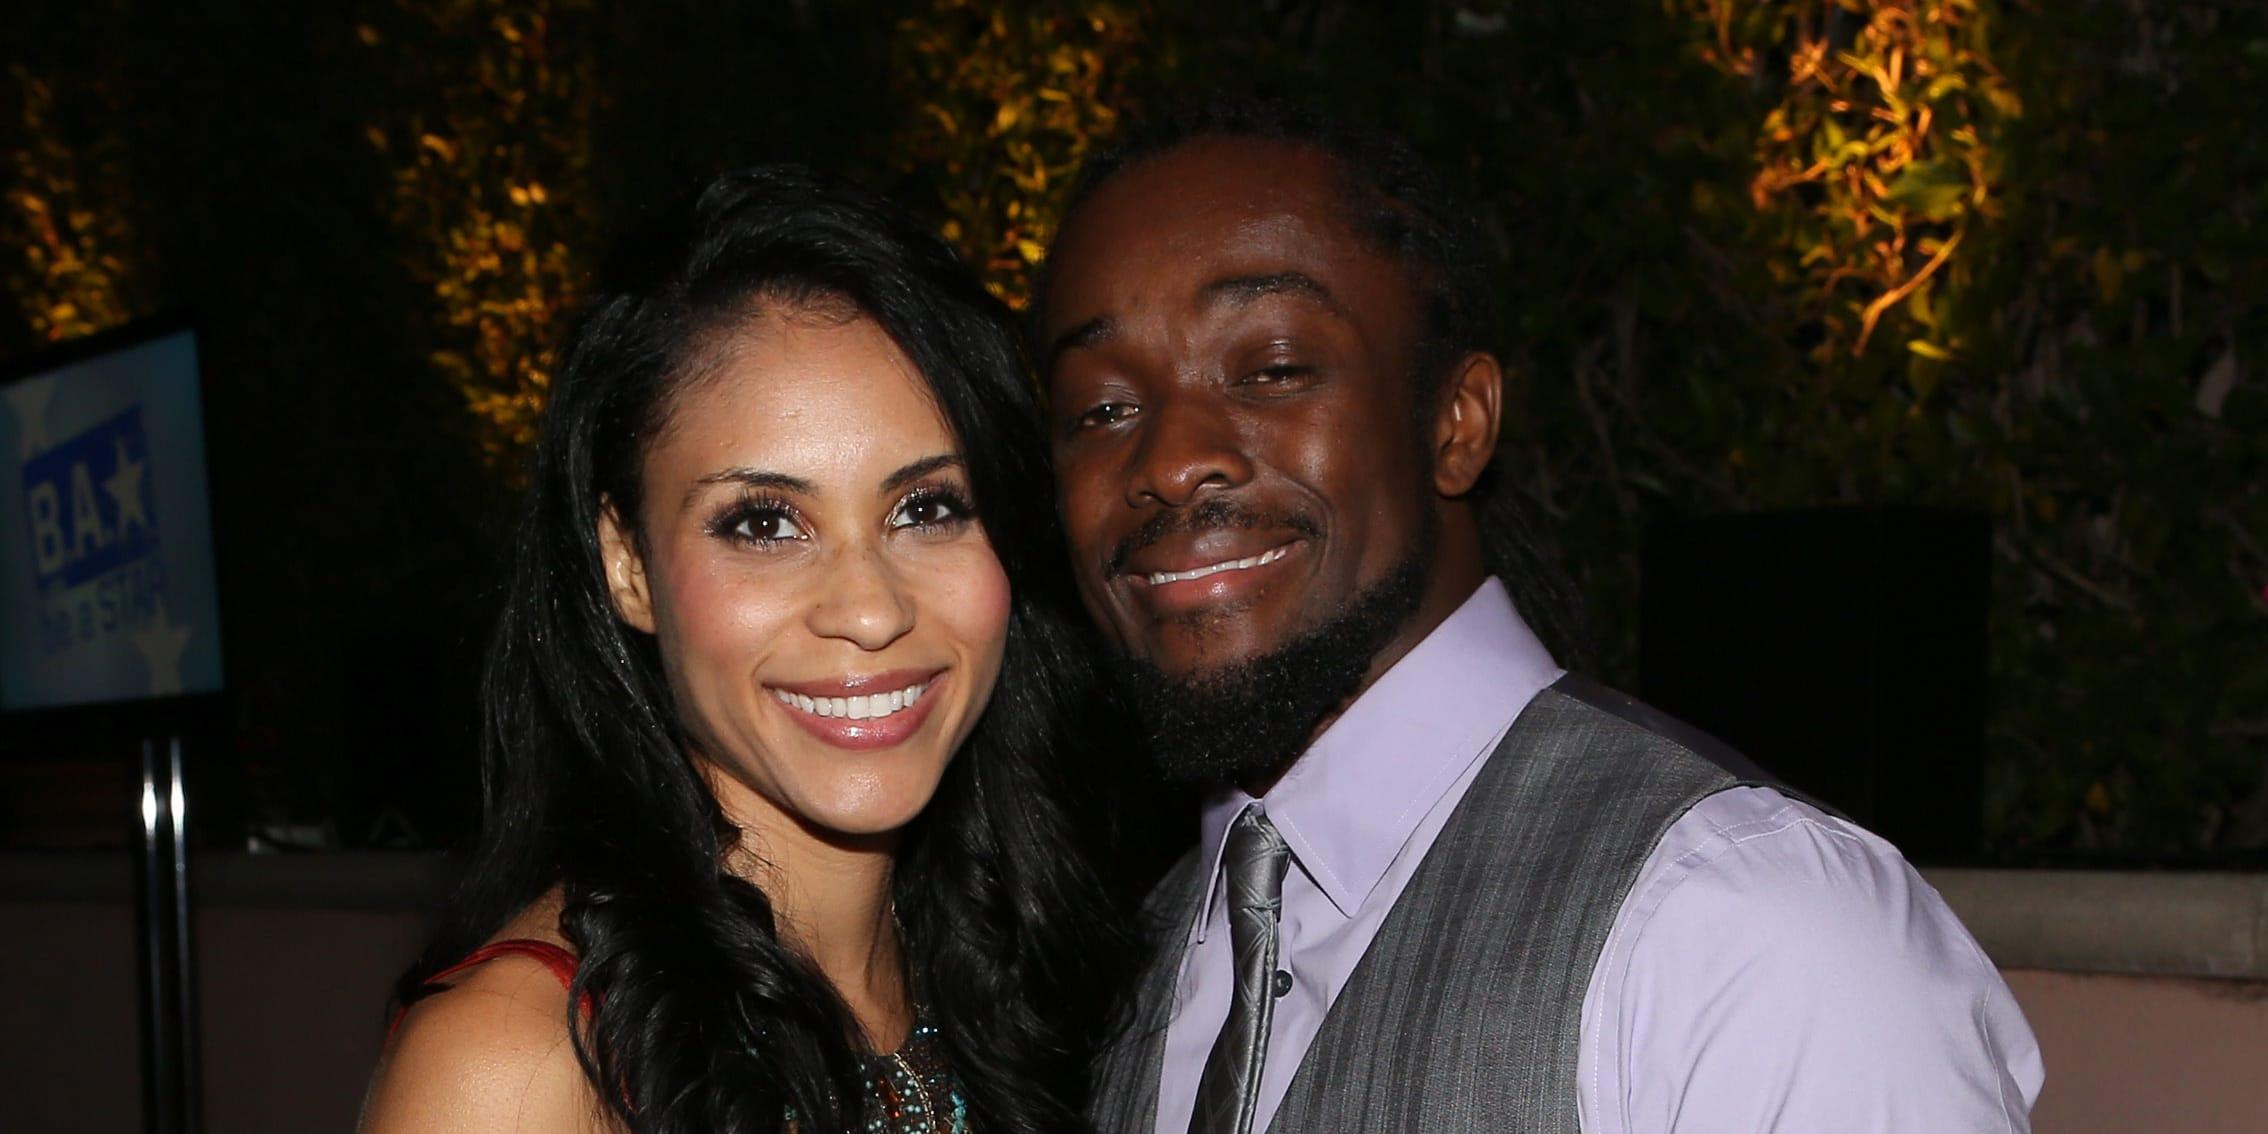 Kofi Kingston And His Wife